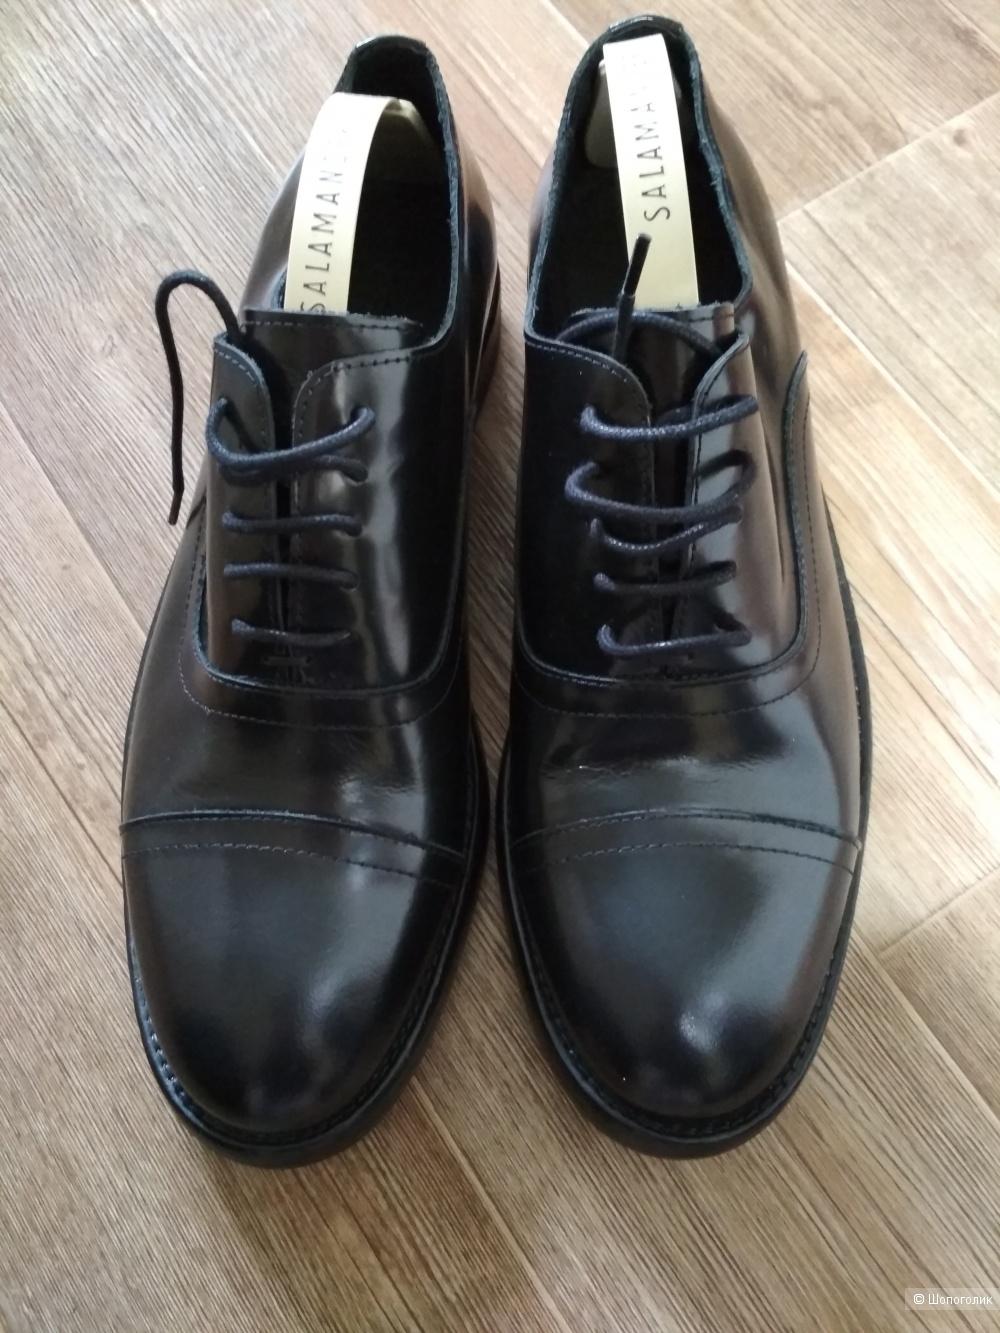 Ботинки Samsoe & Samsoe размер 42